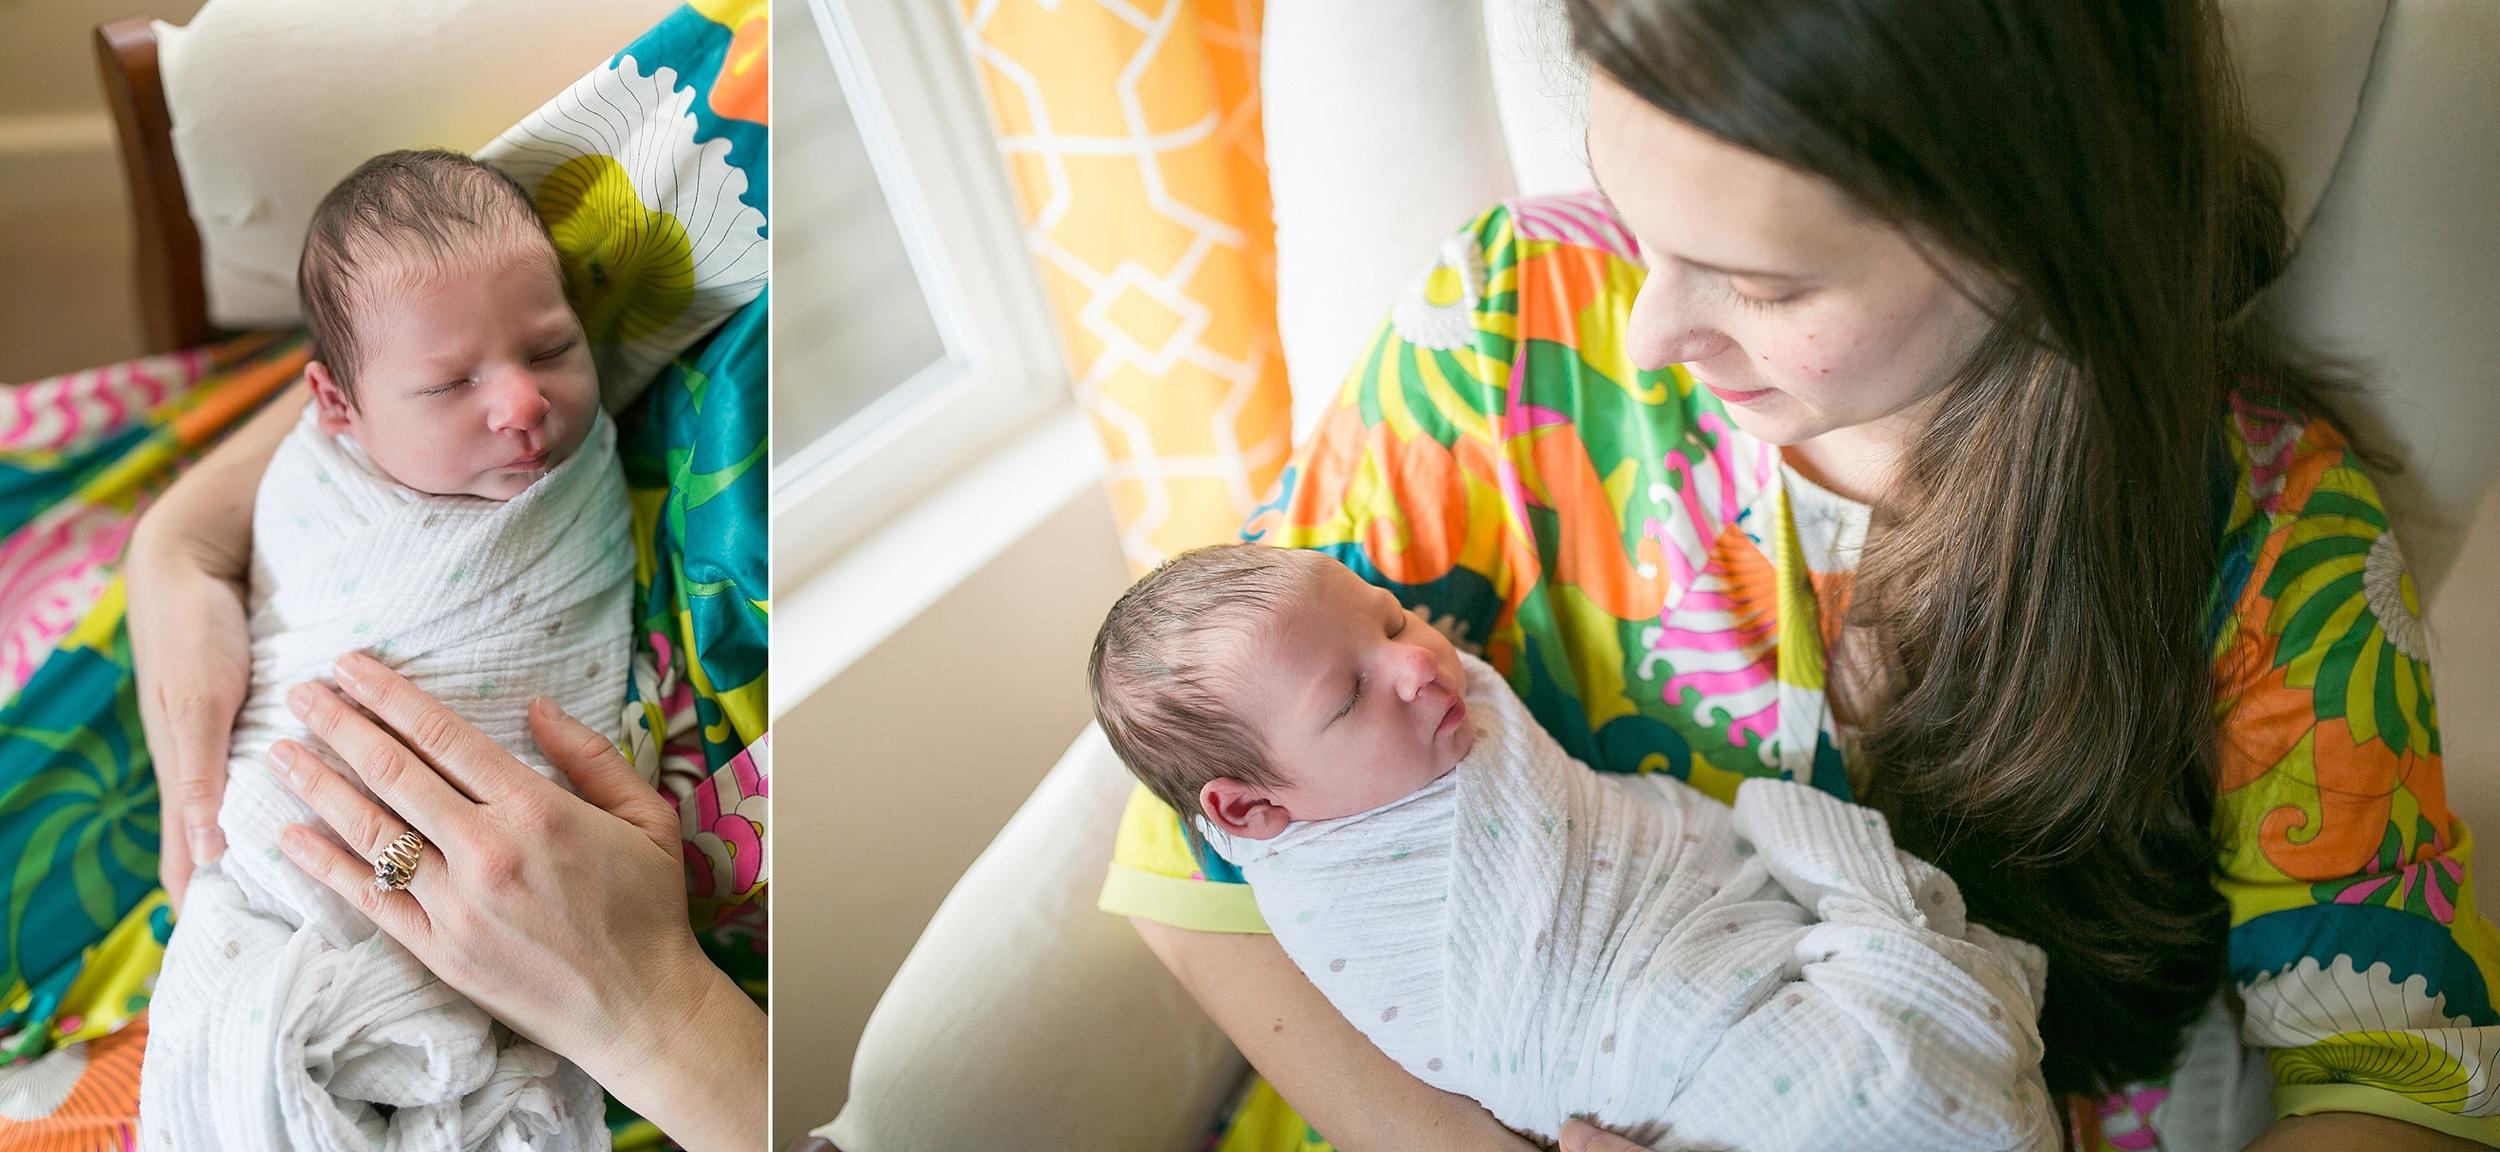 ashley vos photography seattle area lifestyle newborn maternity photographer_0291.jpg